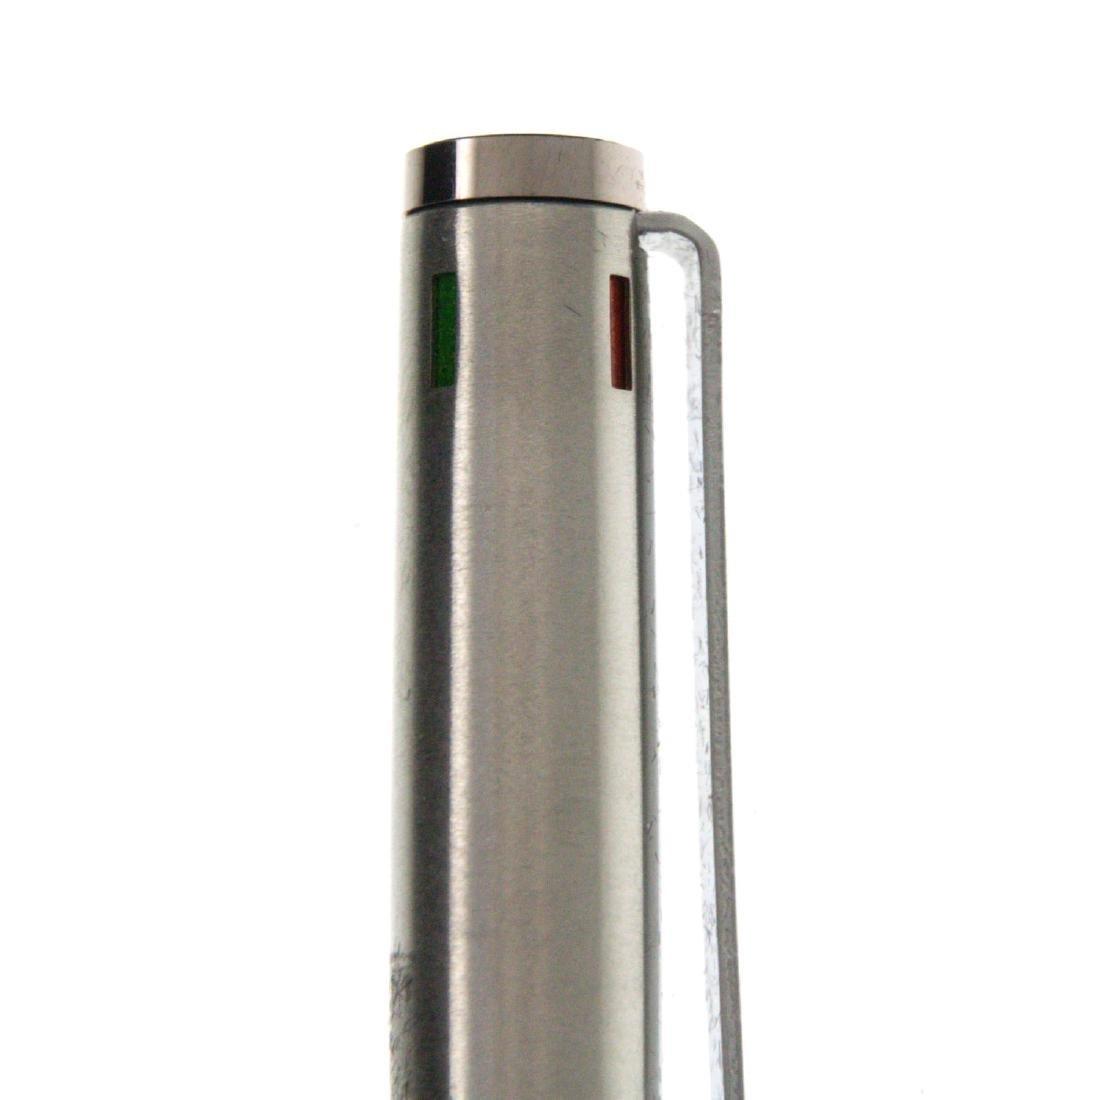 Set of 10 Montblanc Four Color Gyro Ballpoint Pens. - 4